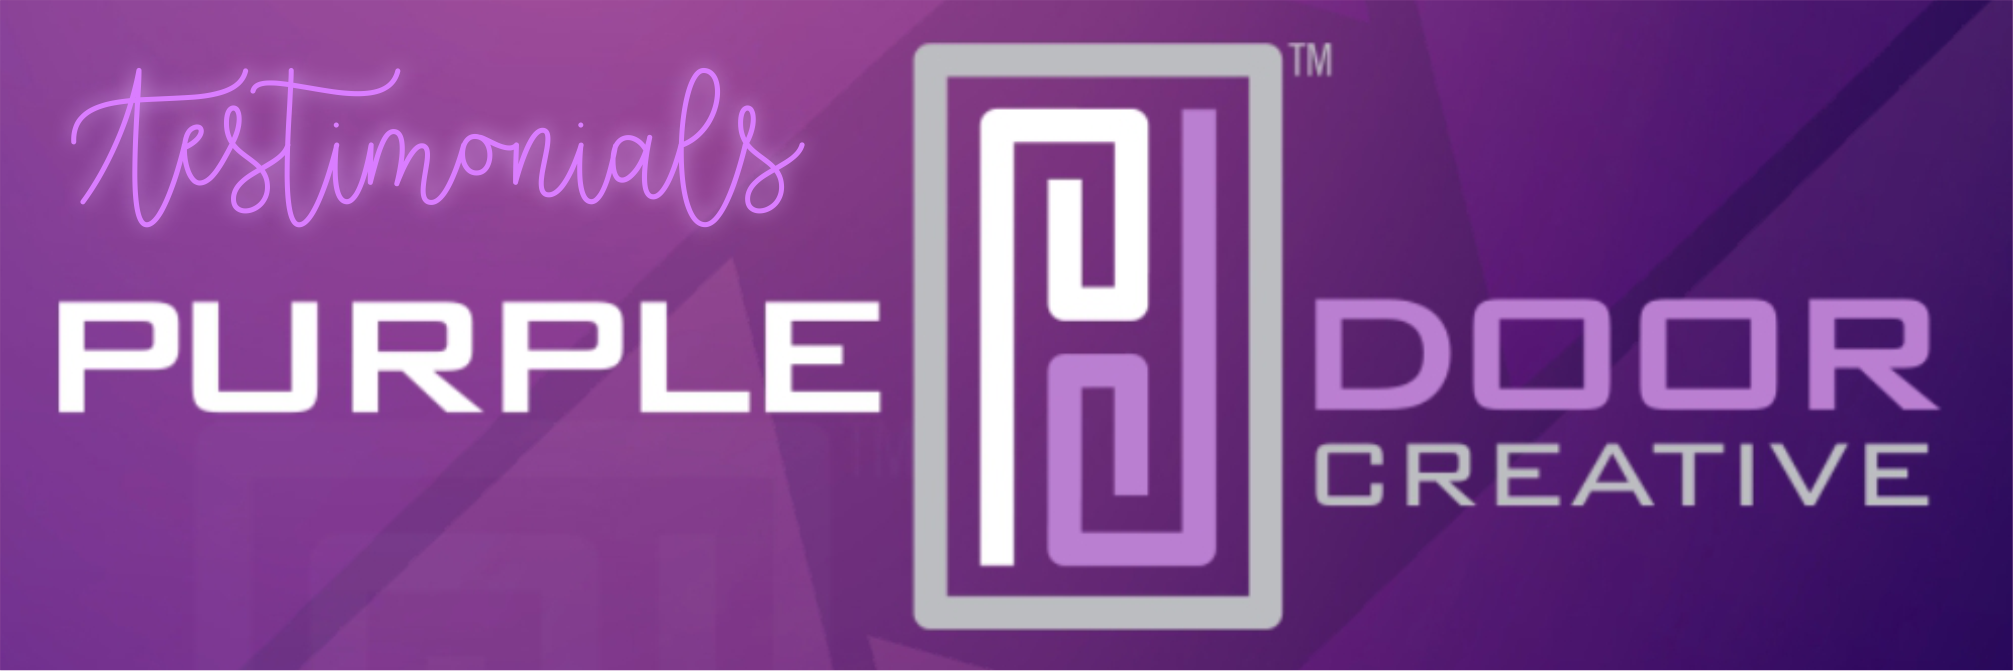 Purple Door Creative logo and Testimonials